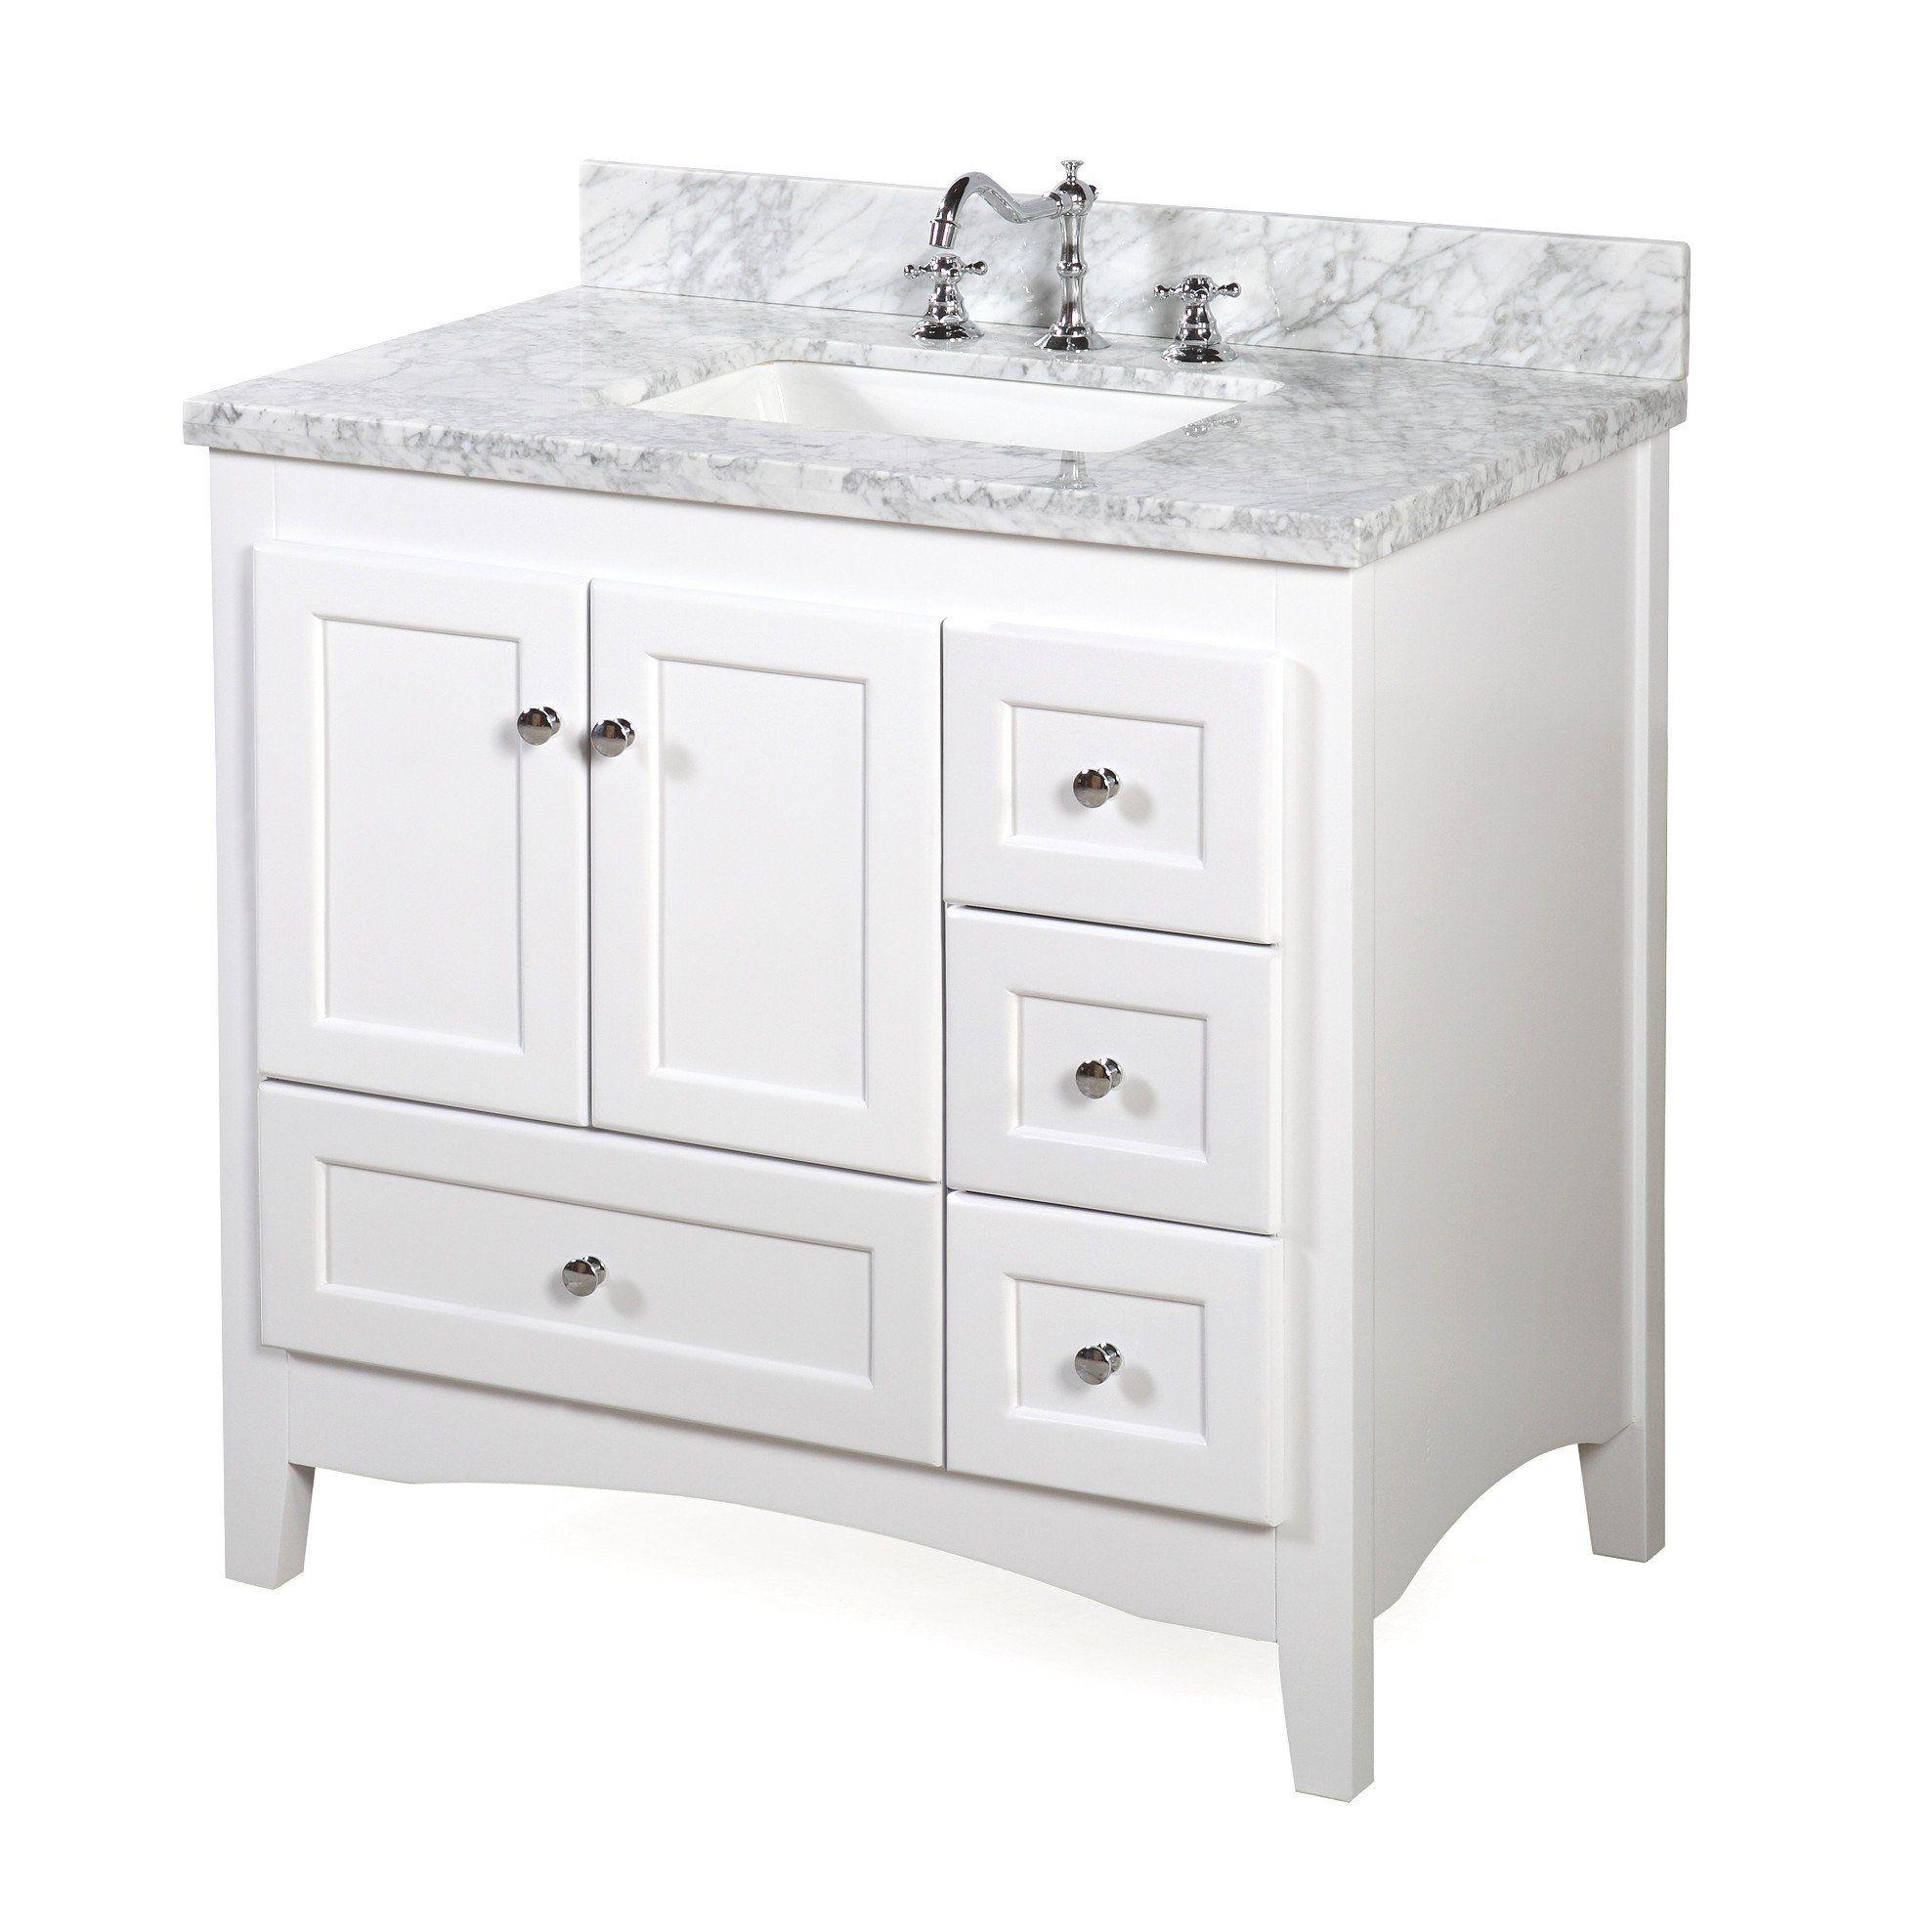 Abbey 36 Inch Vanity Carrara Marble Single Bathroom Vanity